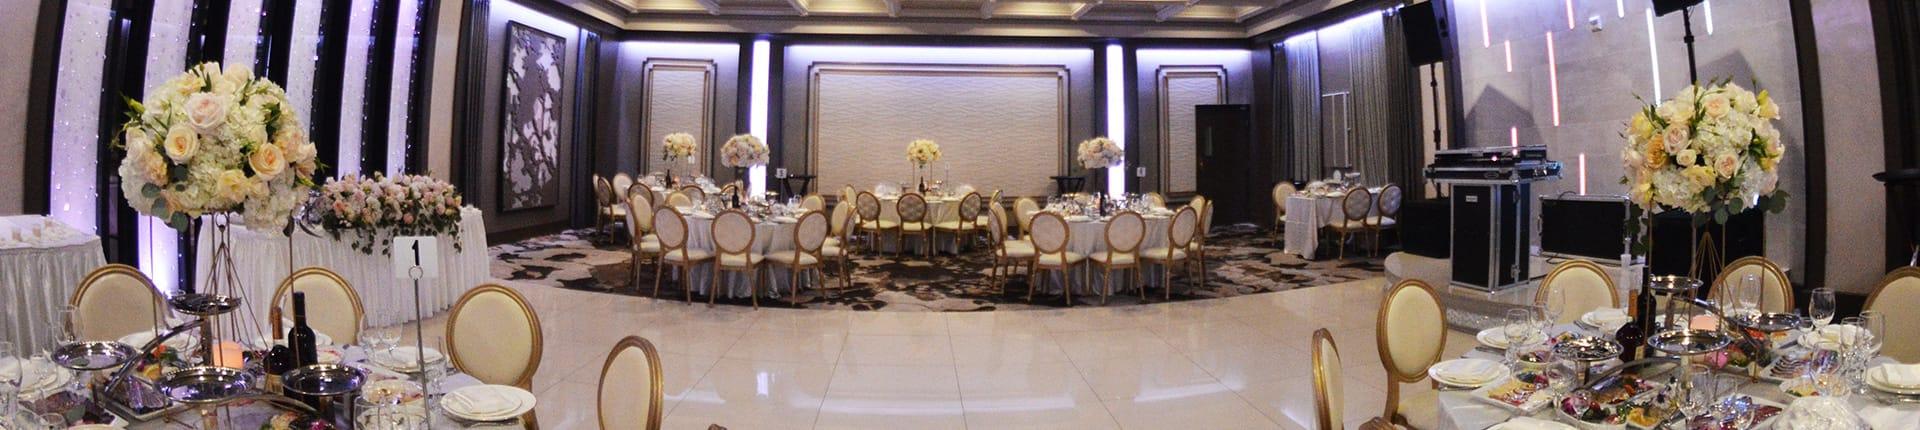 Renaissance Banquet Hall - Crystal Ballroom